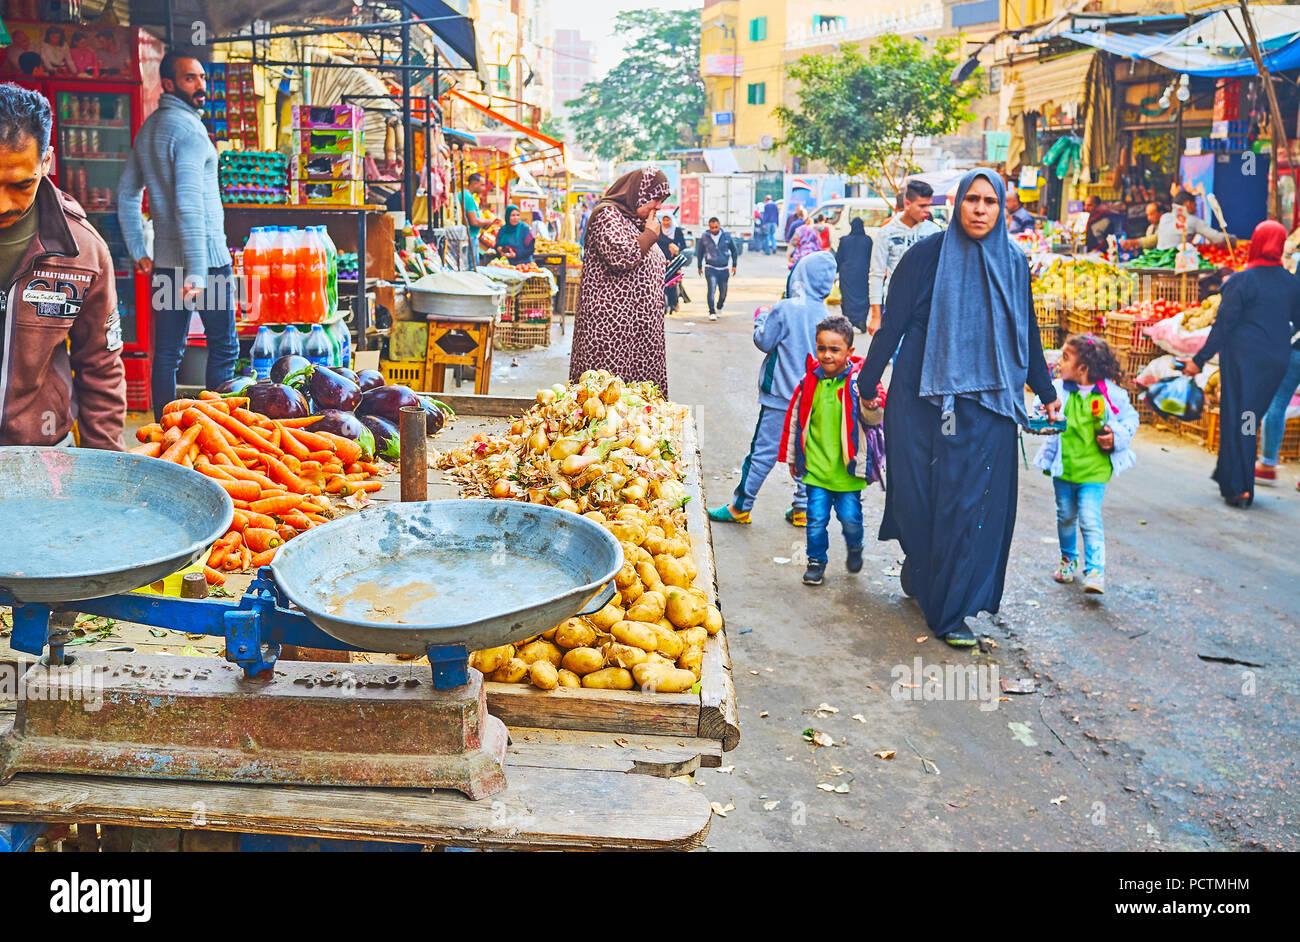 ALEXANDRIA, EGYPT - DECEMBER 18, 2017: The local families